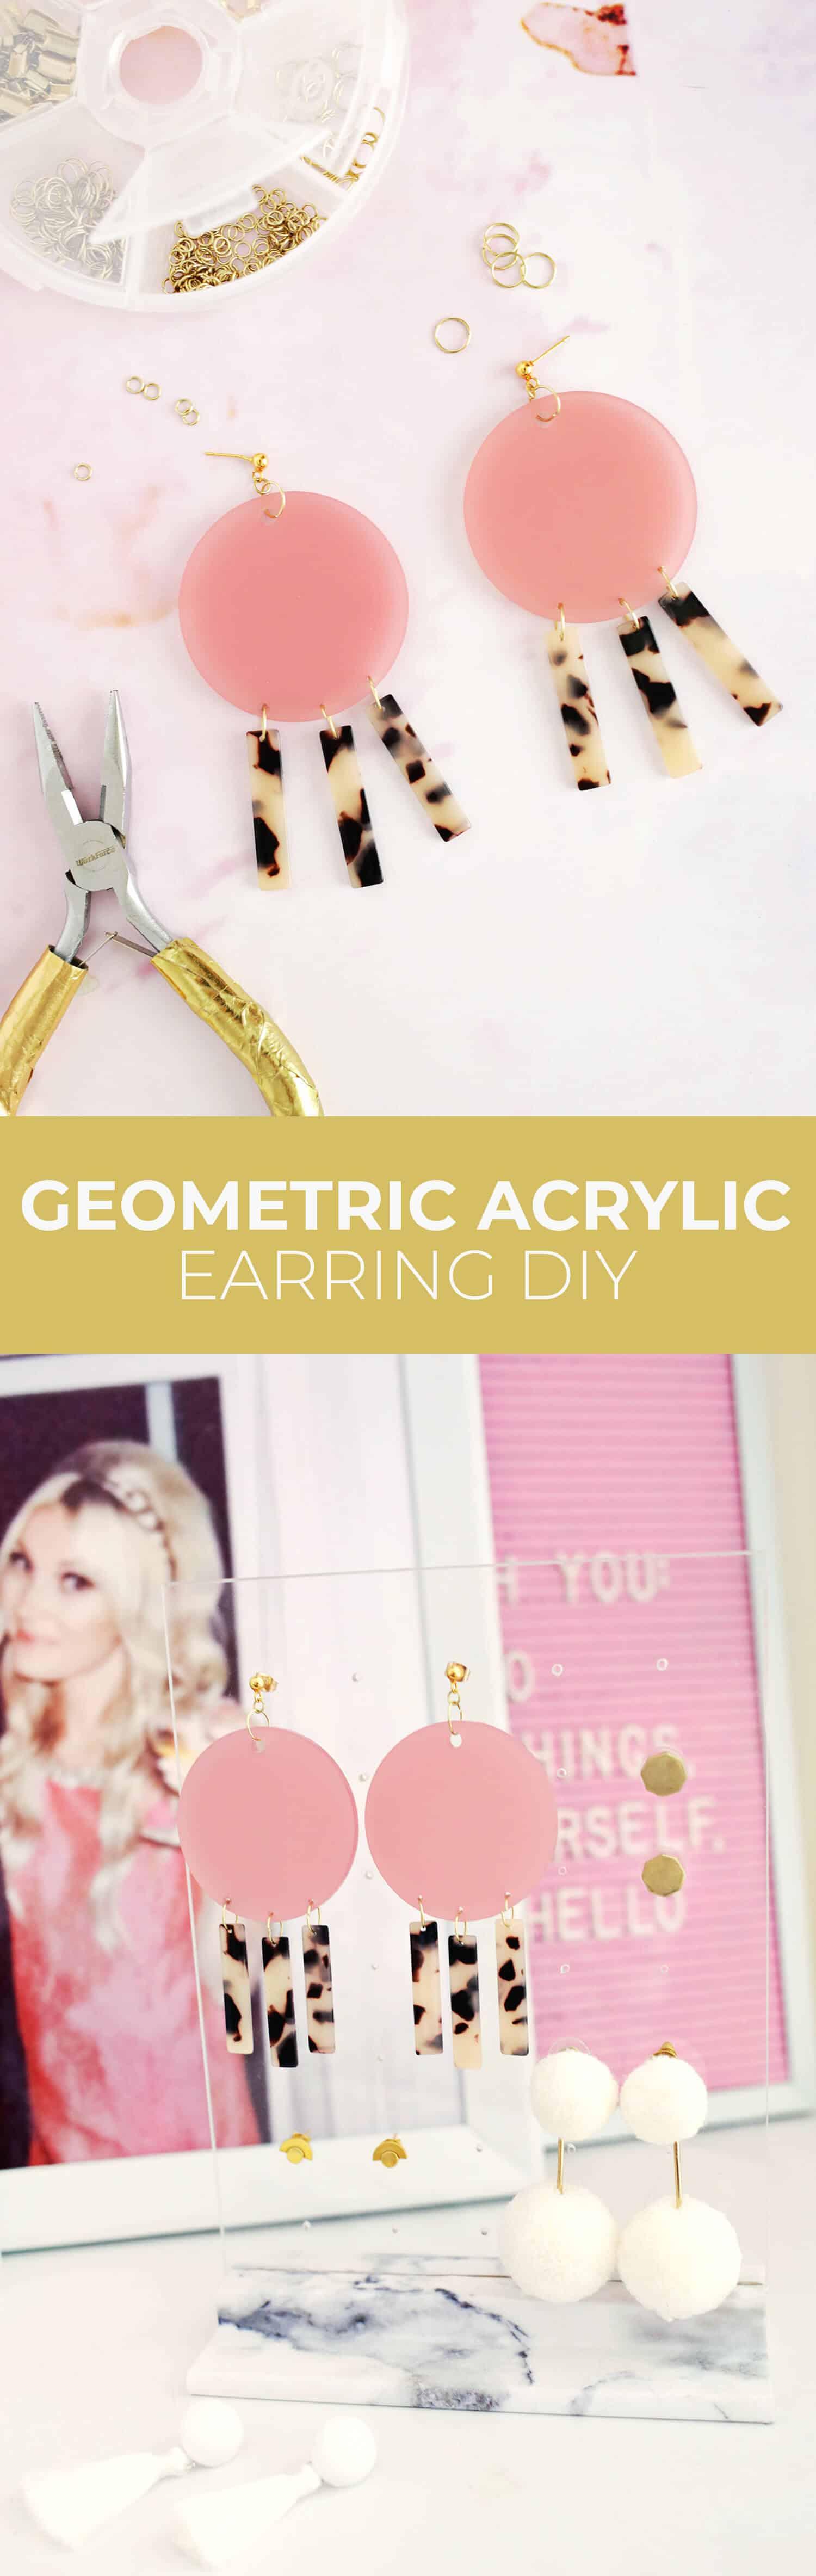 Geometric Acrylic Earring DIY click through for tutorial